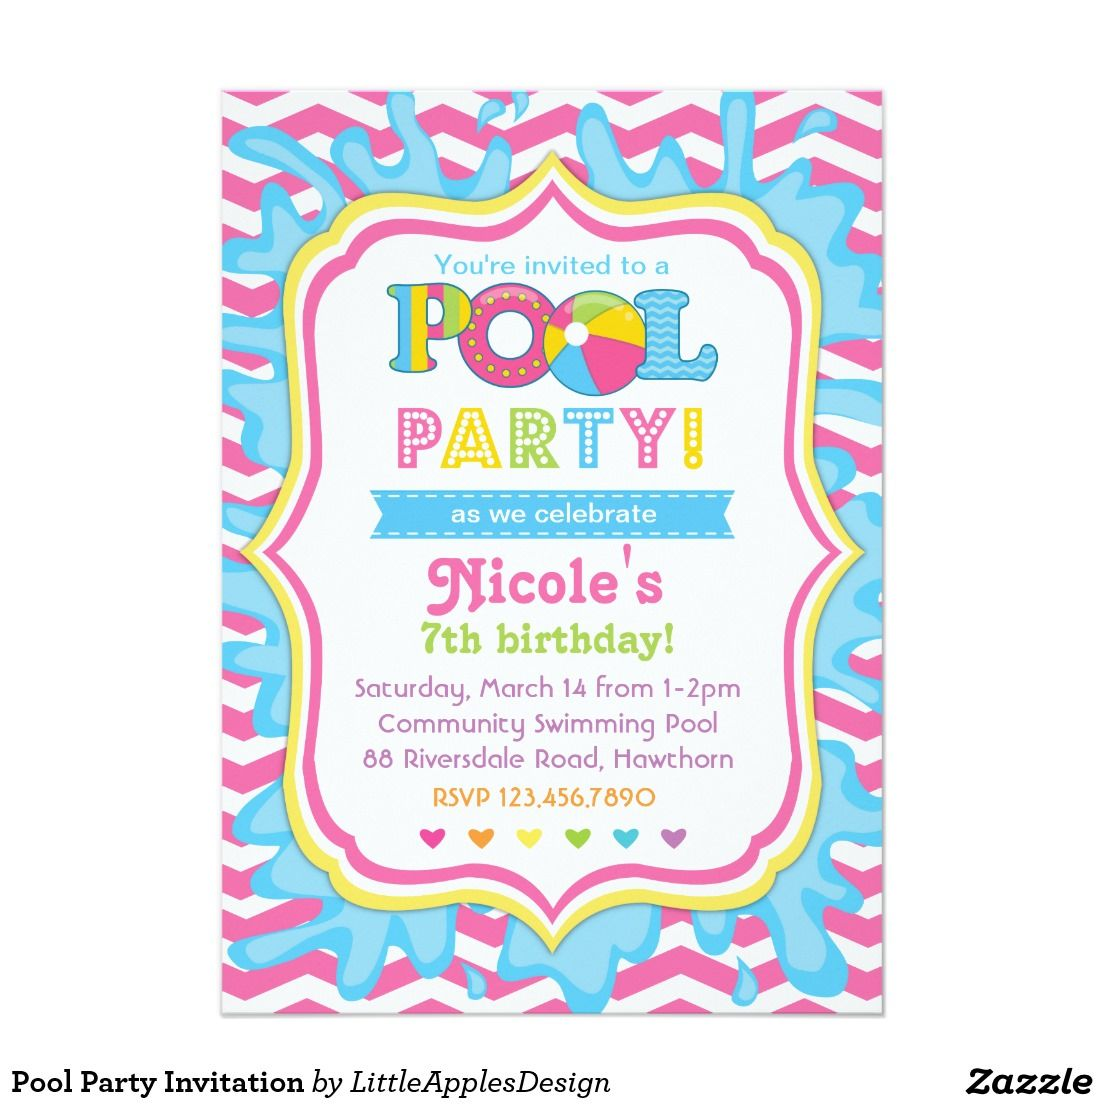 Pool Party Invitation.